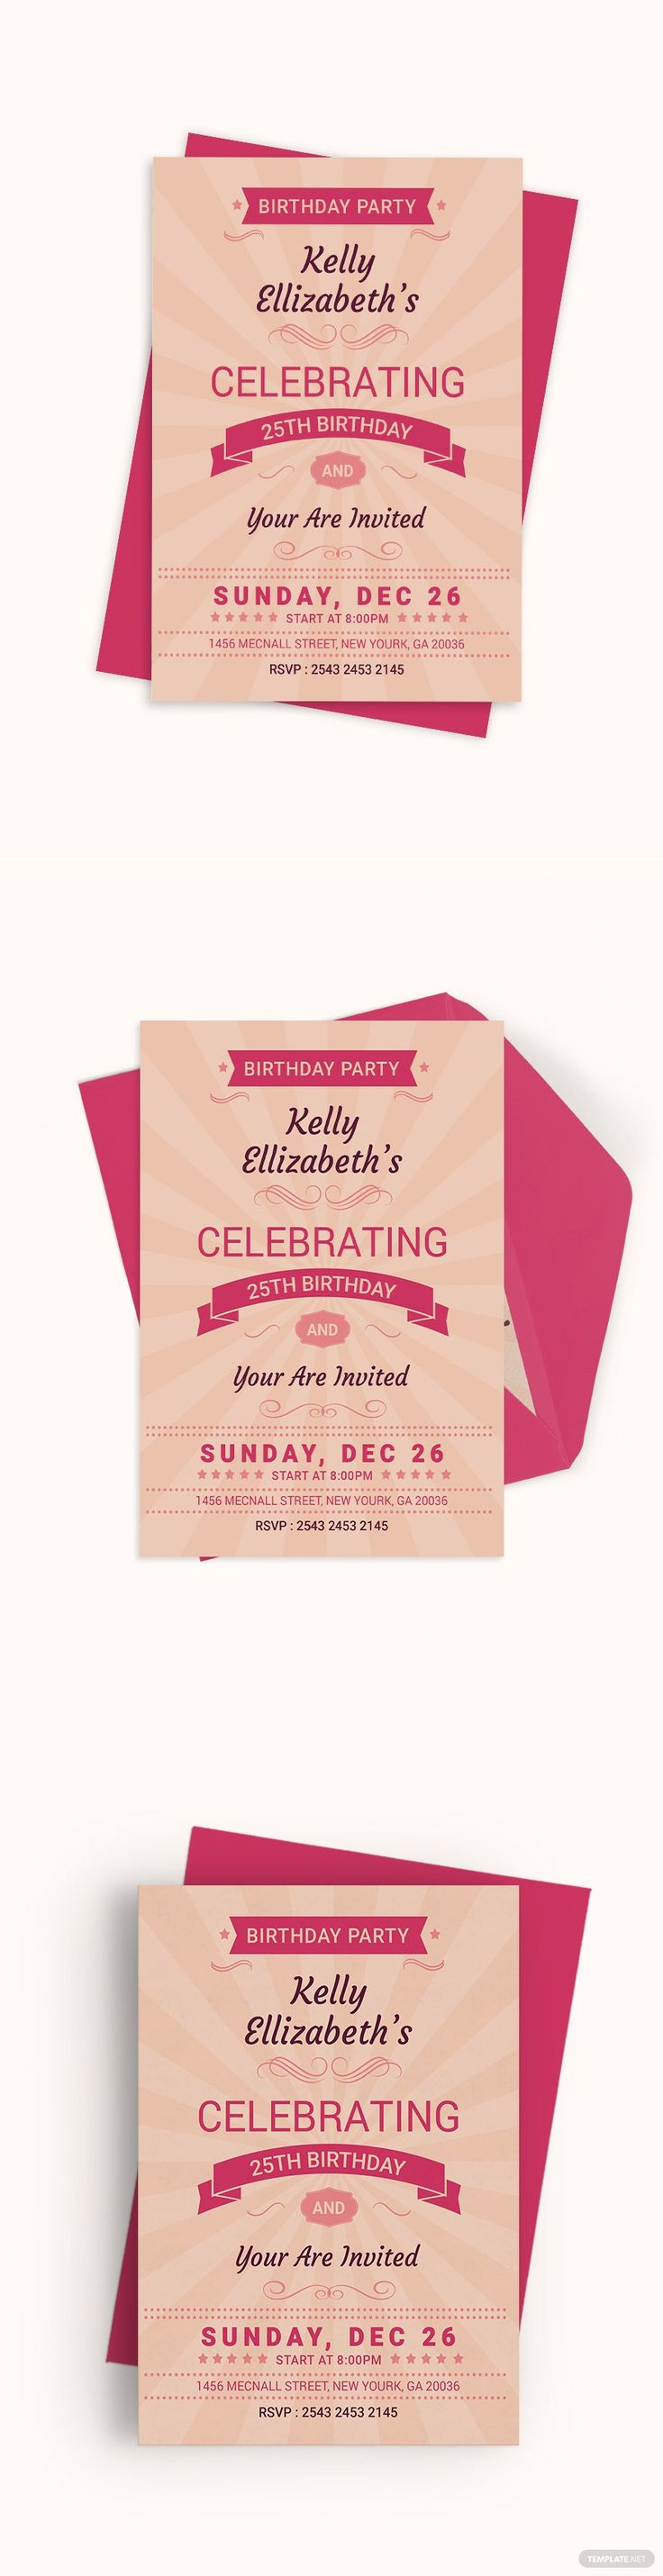 Happy Retro Birthday Party Invitation Card Template - Word ...